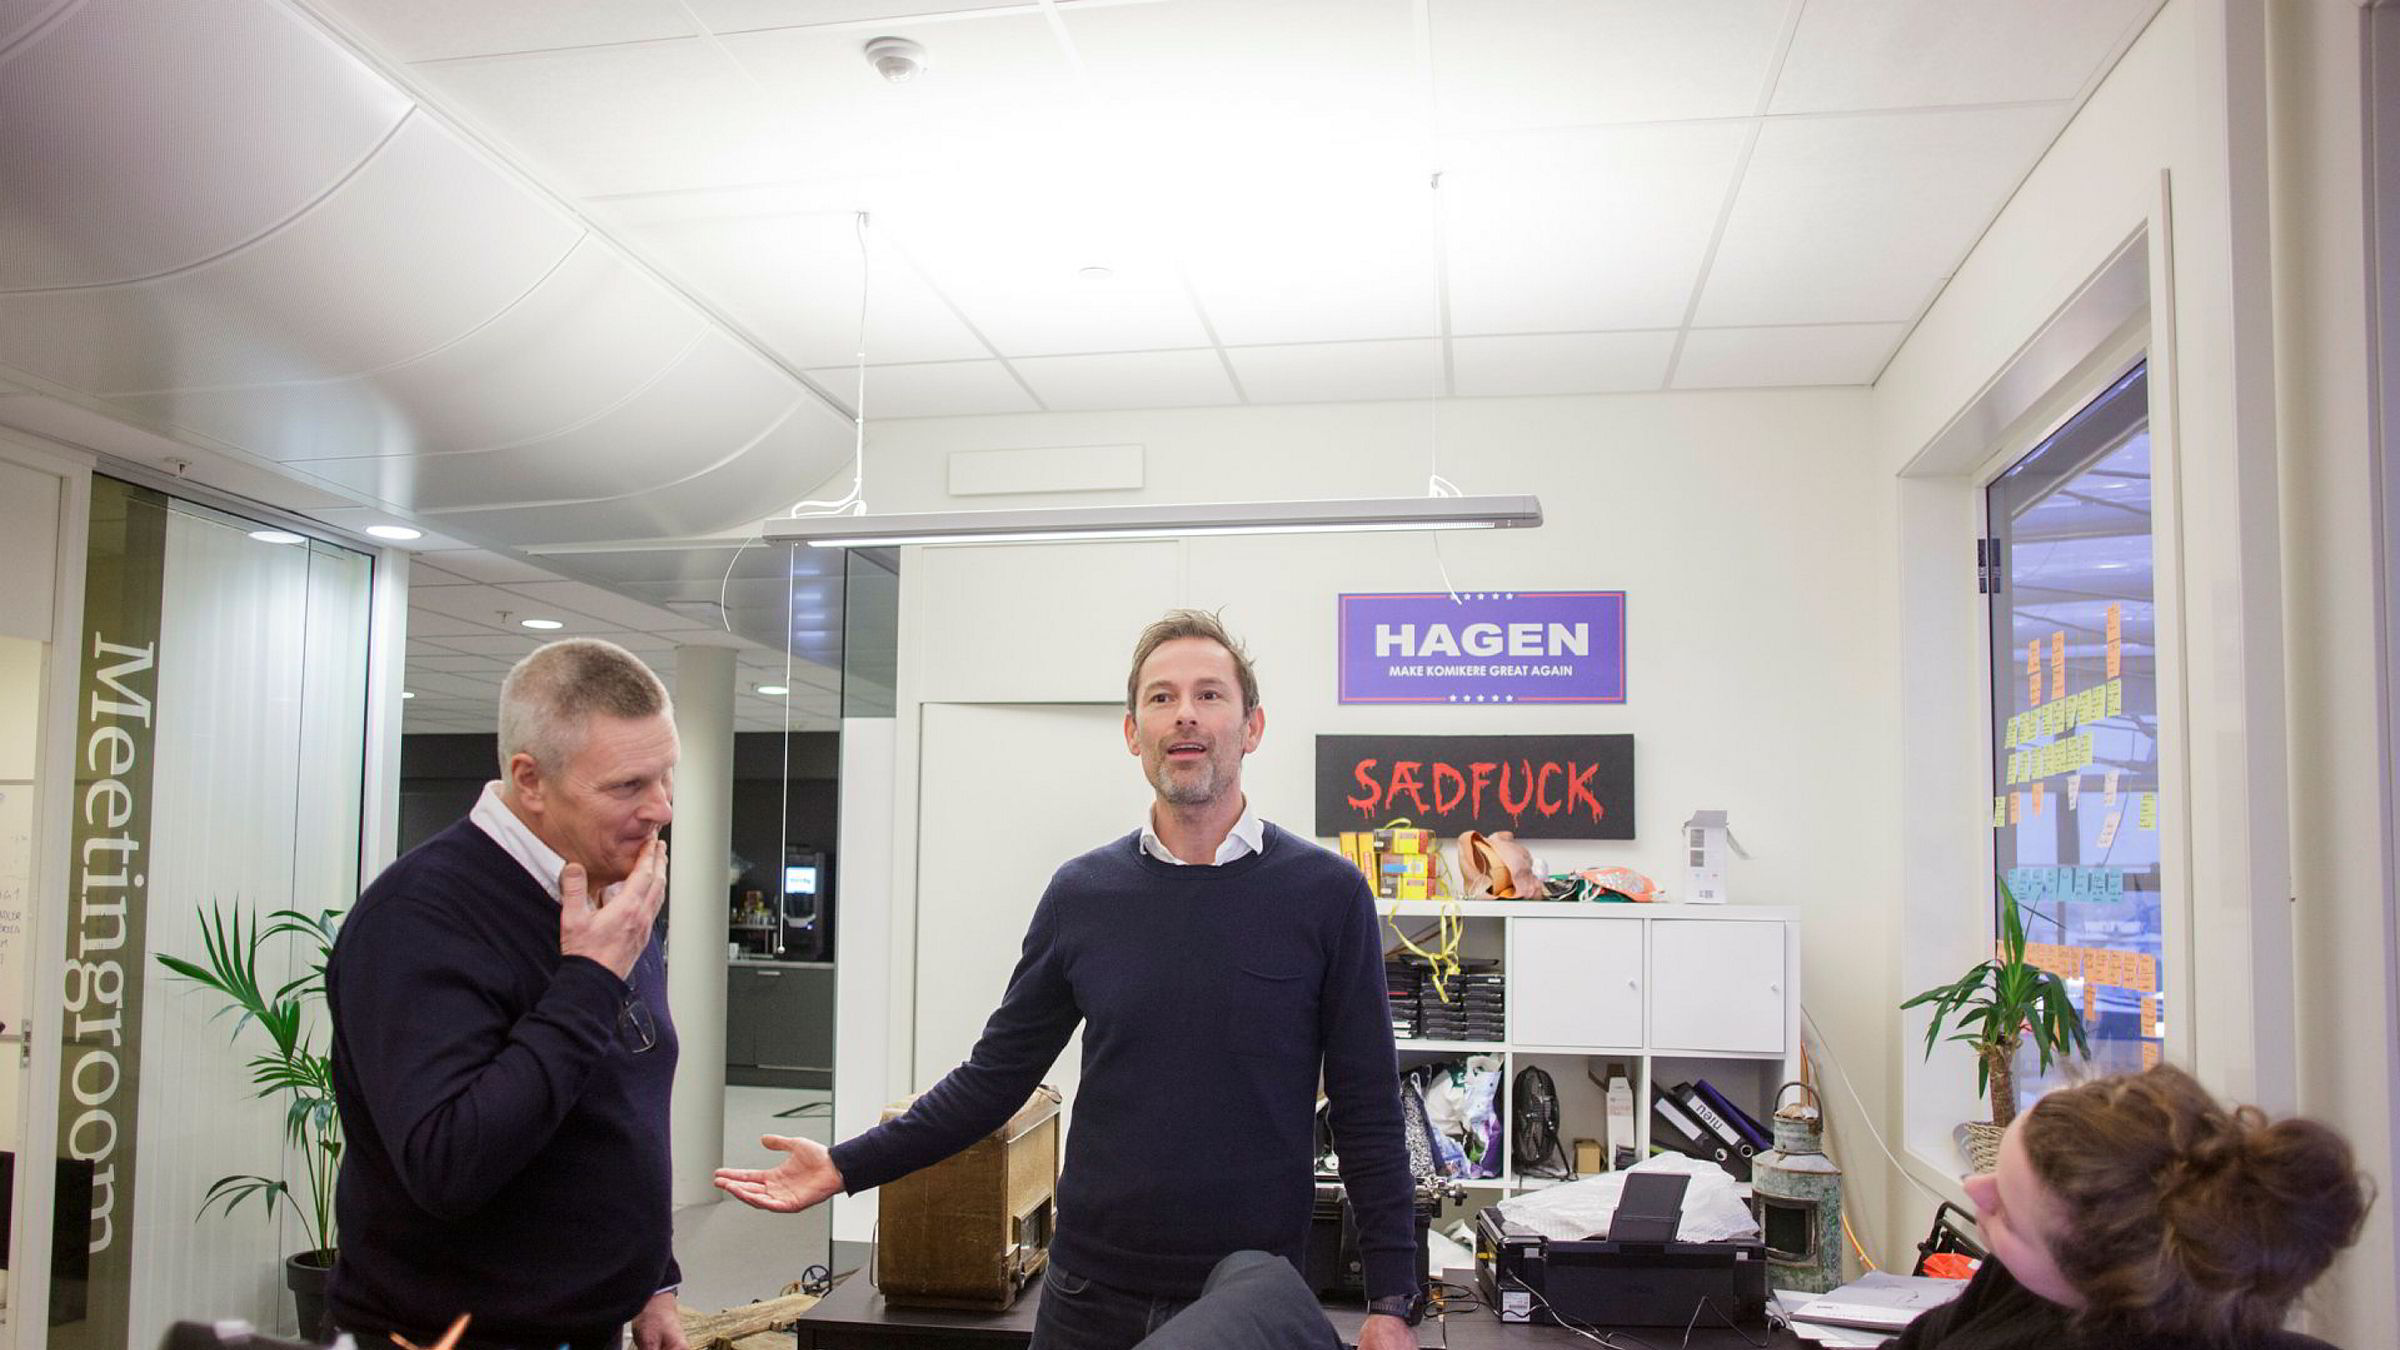 Morten Bank, konsernsjef i Monday Media-gruppen, har kjøpt flere store humorbyråer i Norge den siste tiden. Her med den svenske konsernsjefen Lasse Hallberg i Monday Norge og kollega Thea Børsting.